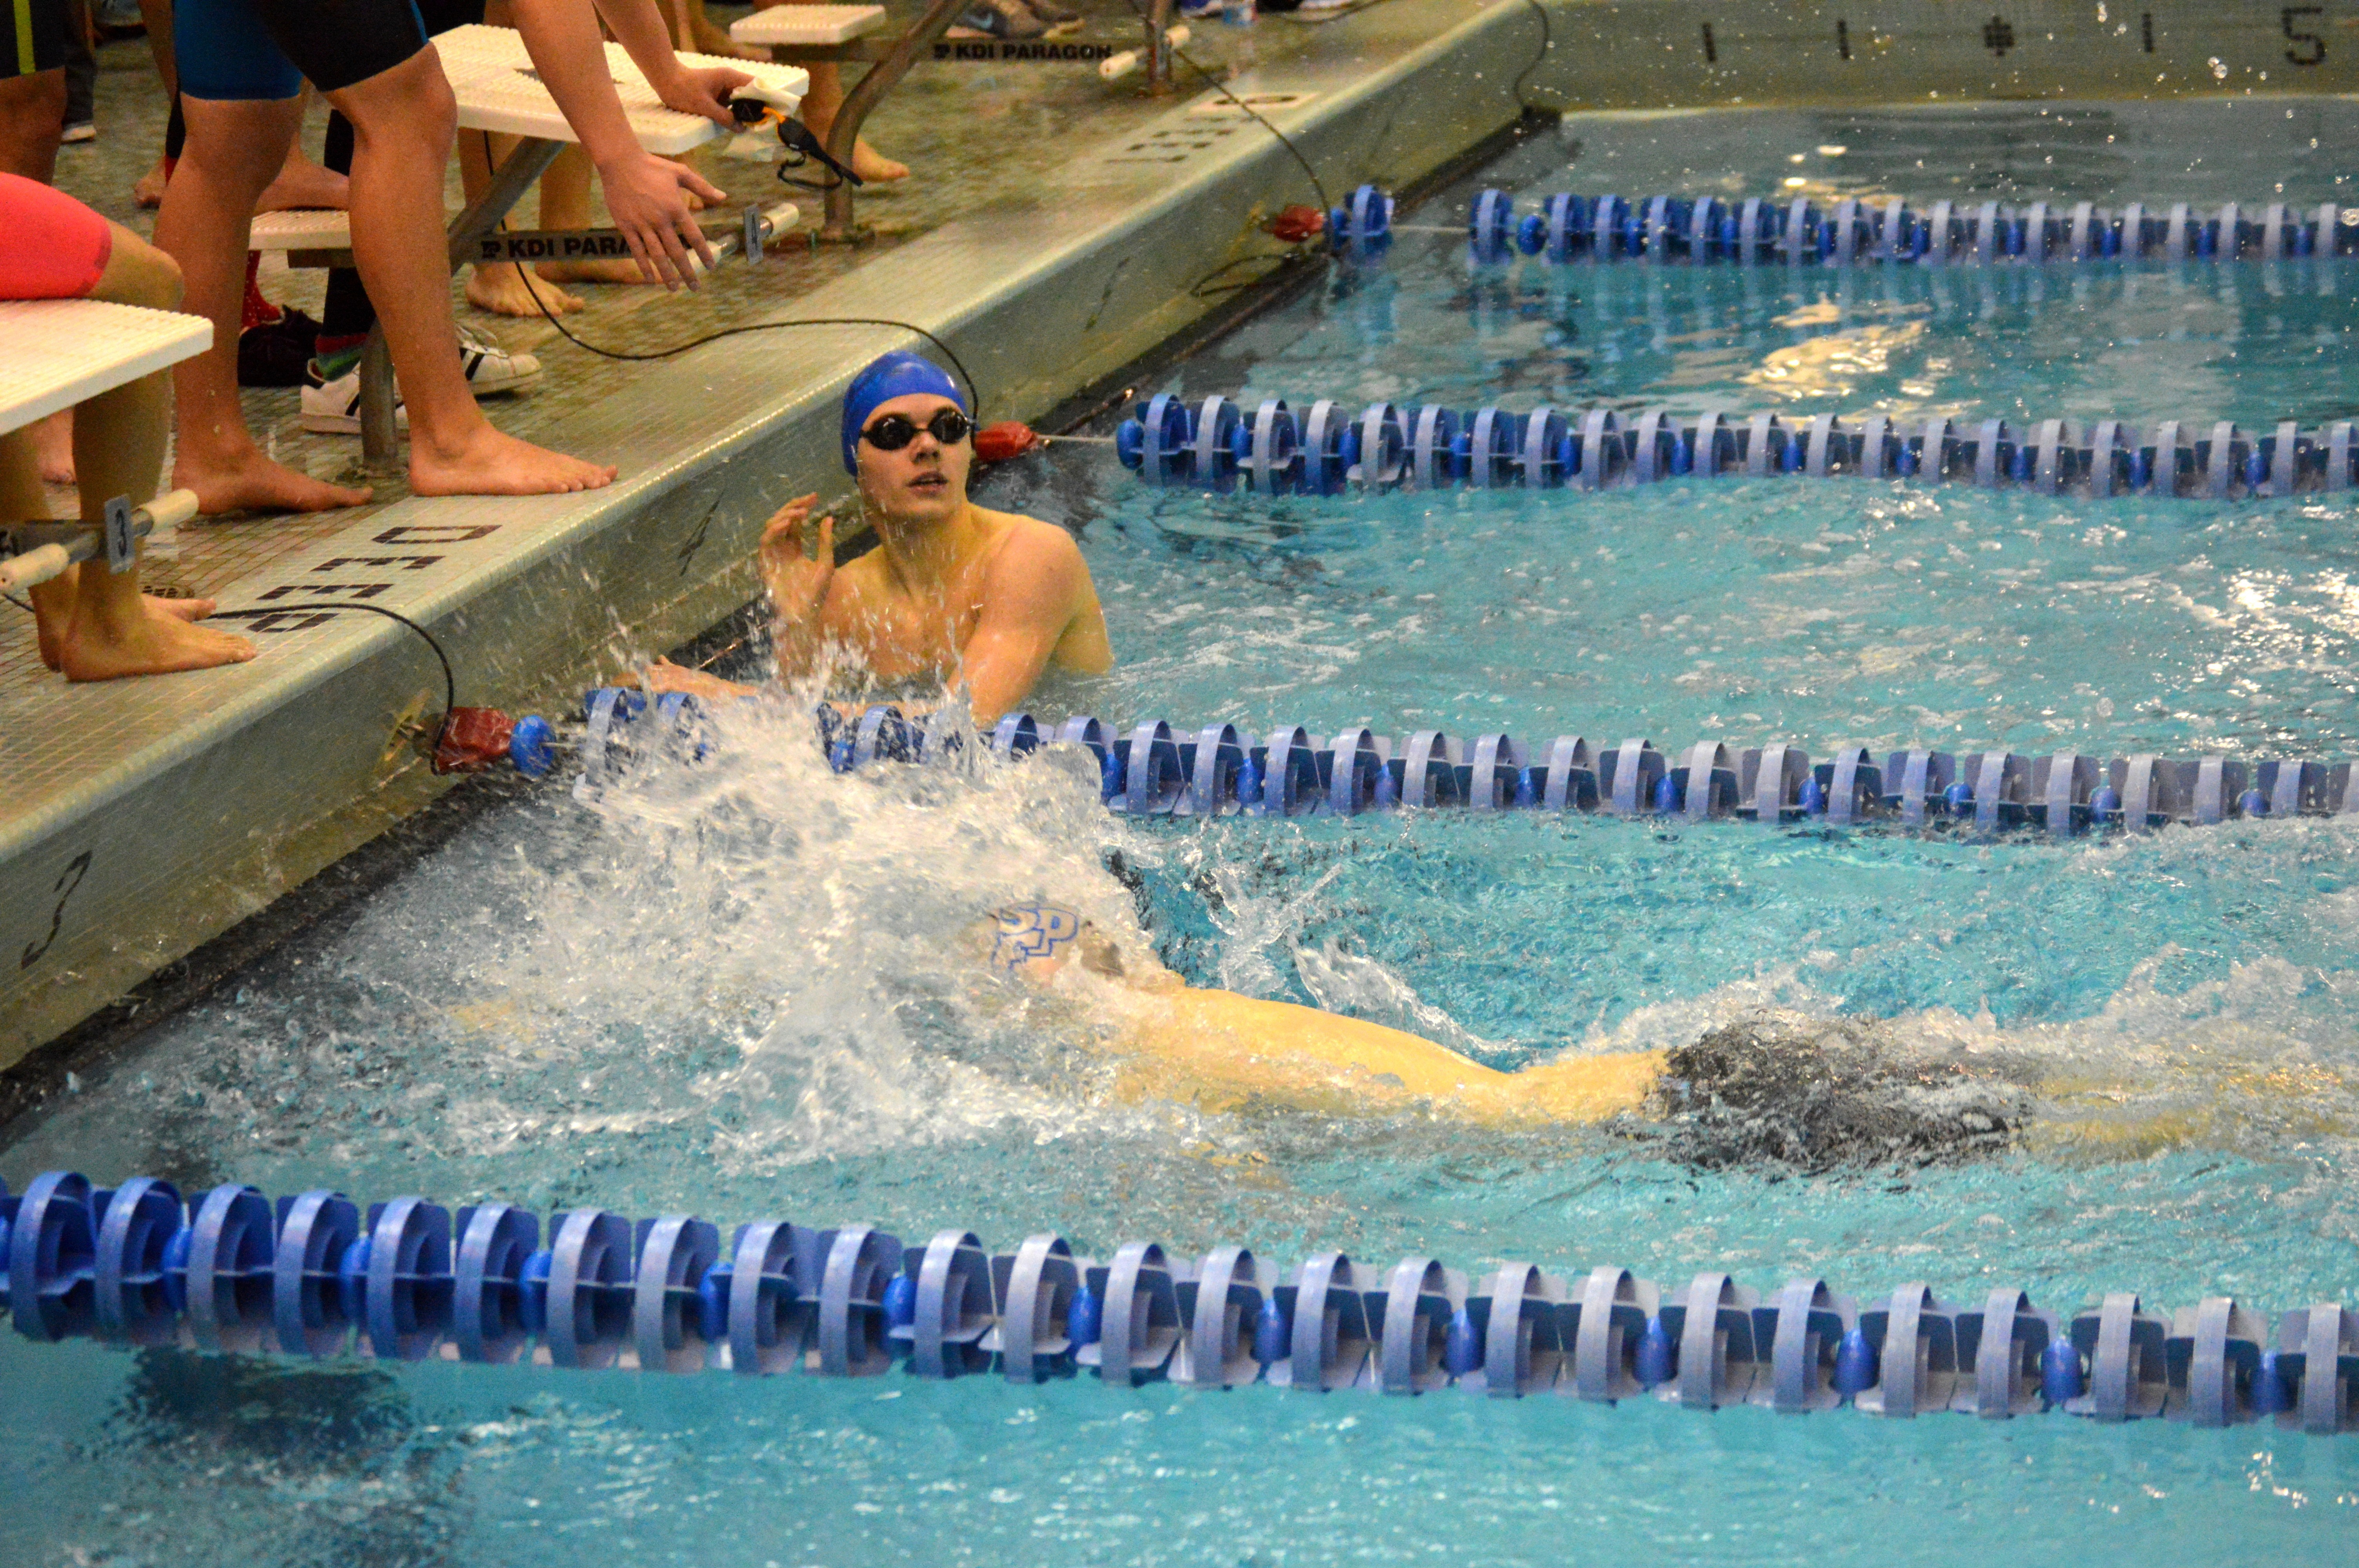 417fb1743b9fce0a4c3d_WF-SPF_-_Josh_Cohen_finishes_second_in_boys_free_relay.JPG